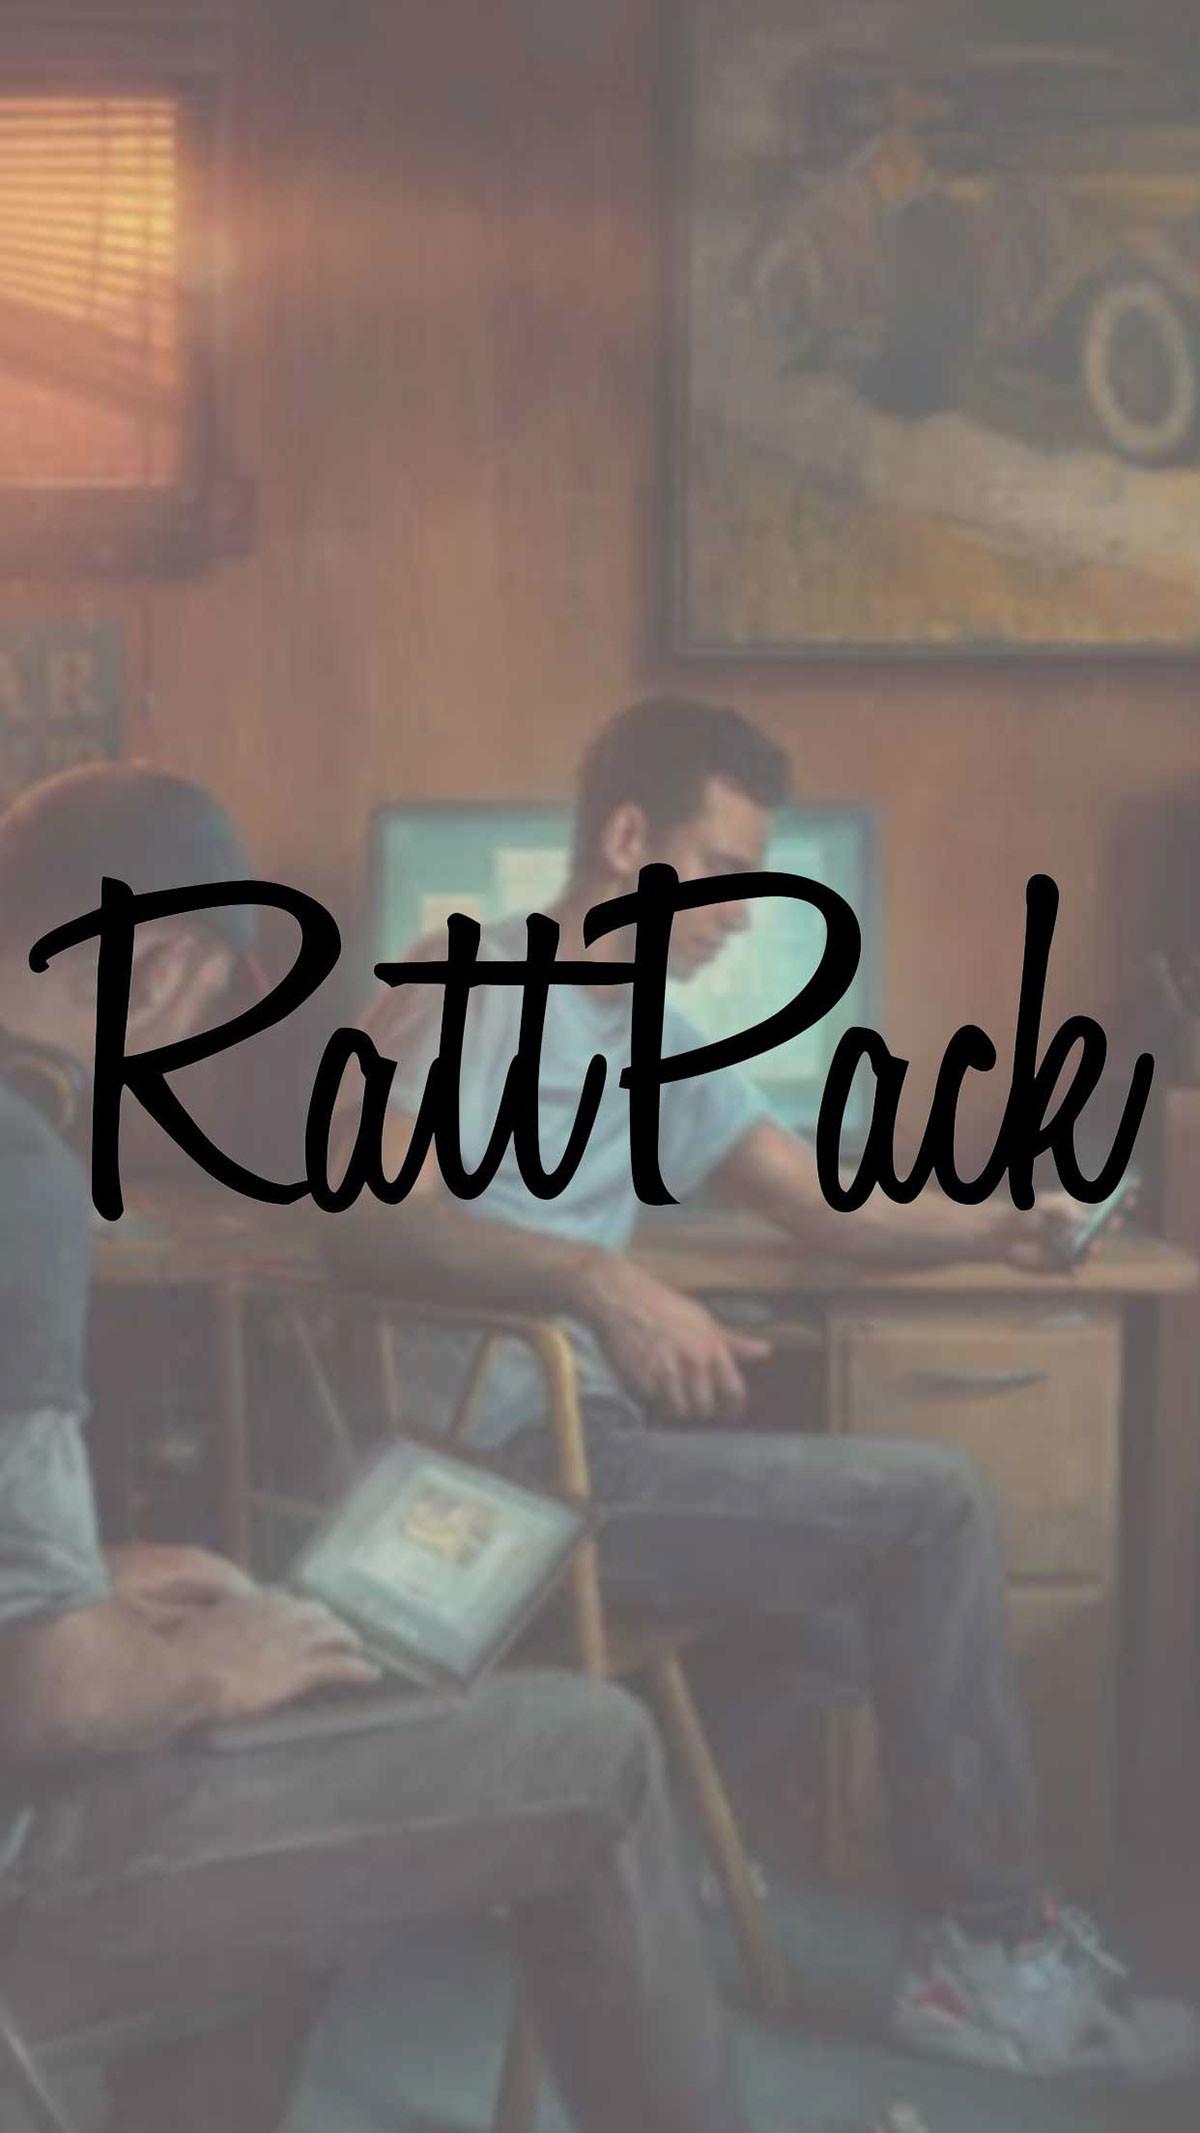 Rattpack iPhone 6 Plus wallpaper #UnderPressure #Logic on Behance